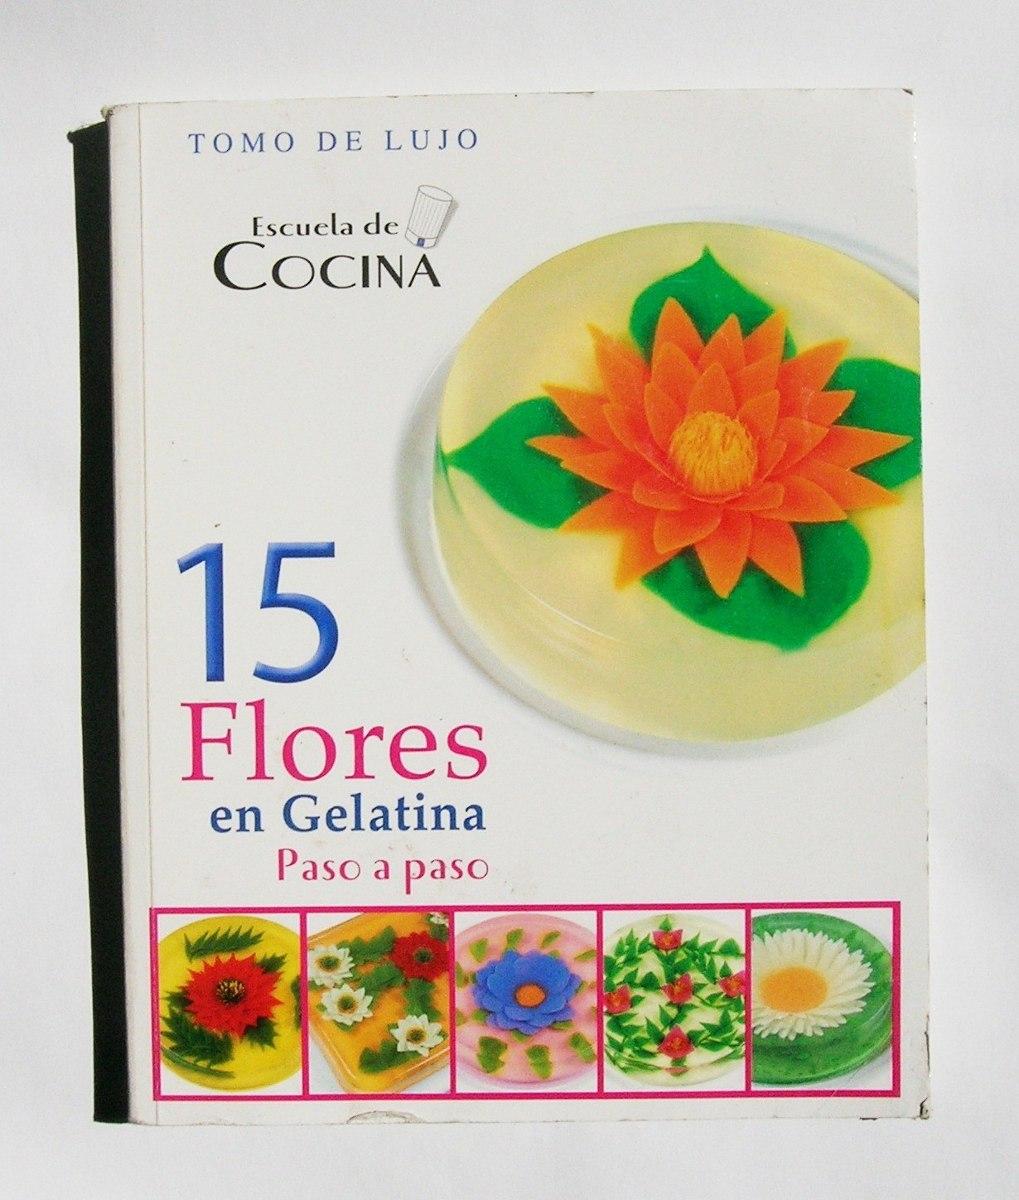 15 flores en gelatina escuela de cocina libro mexicano for Escuela de cocina